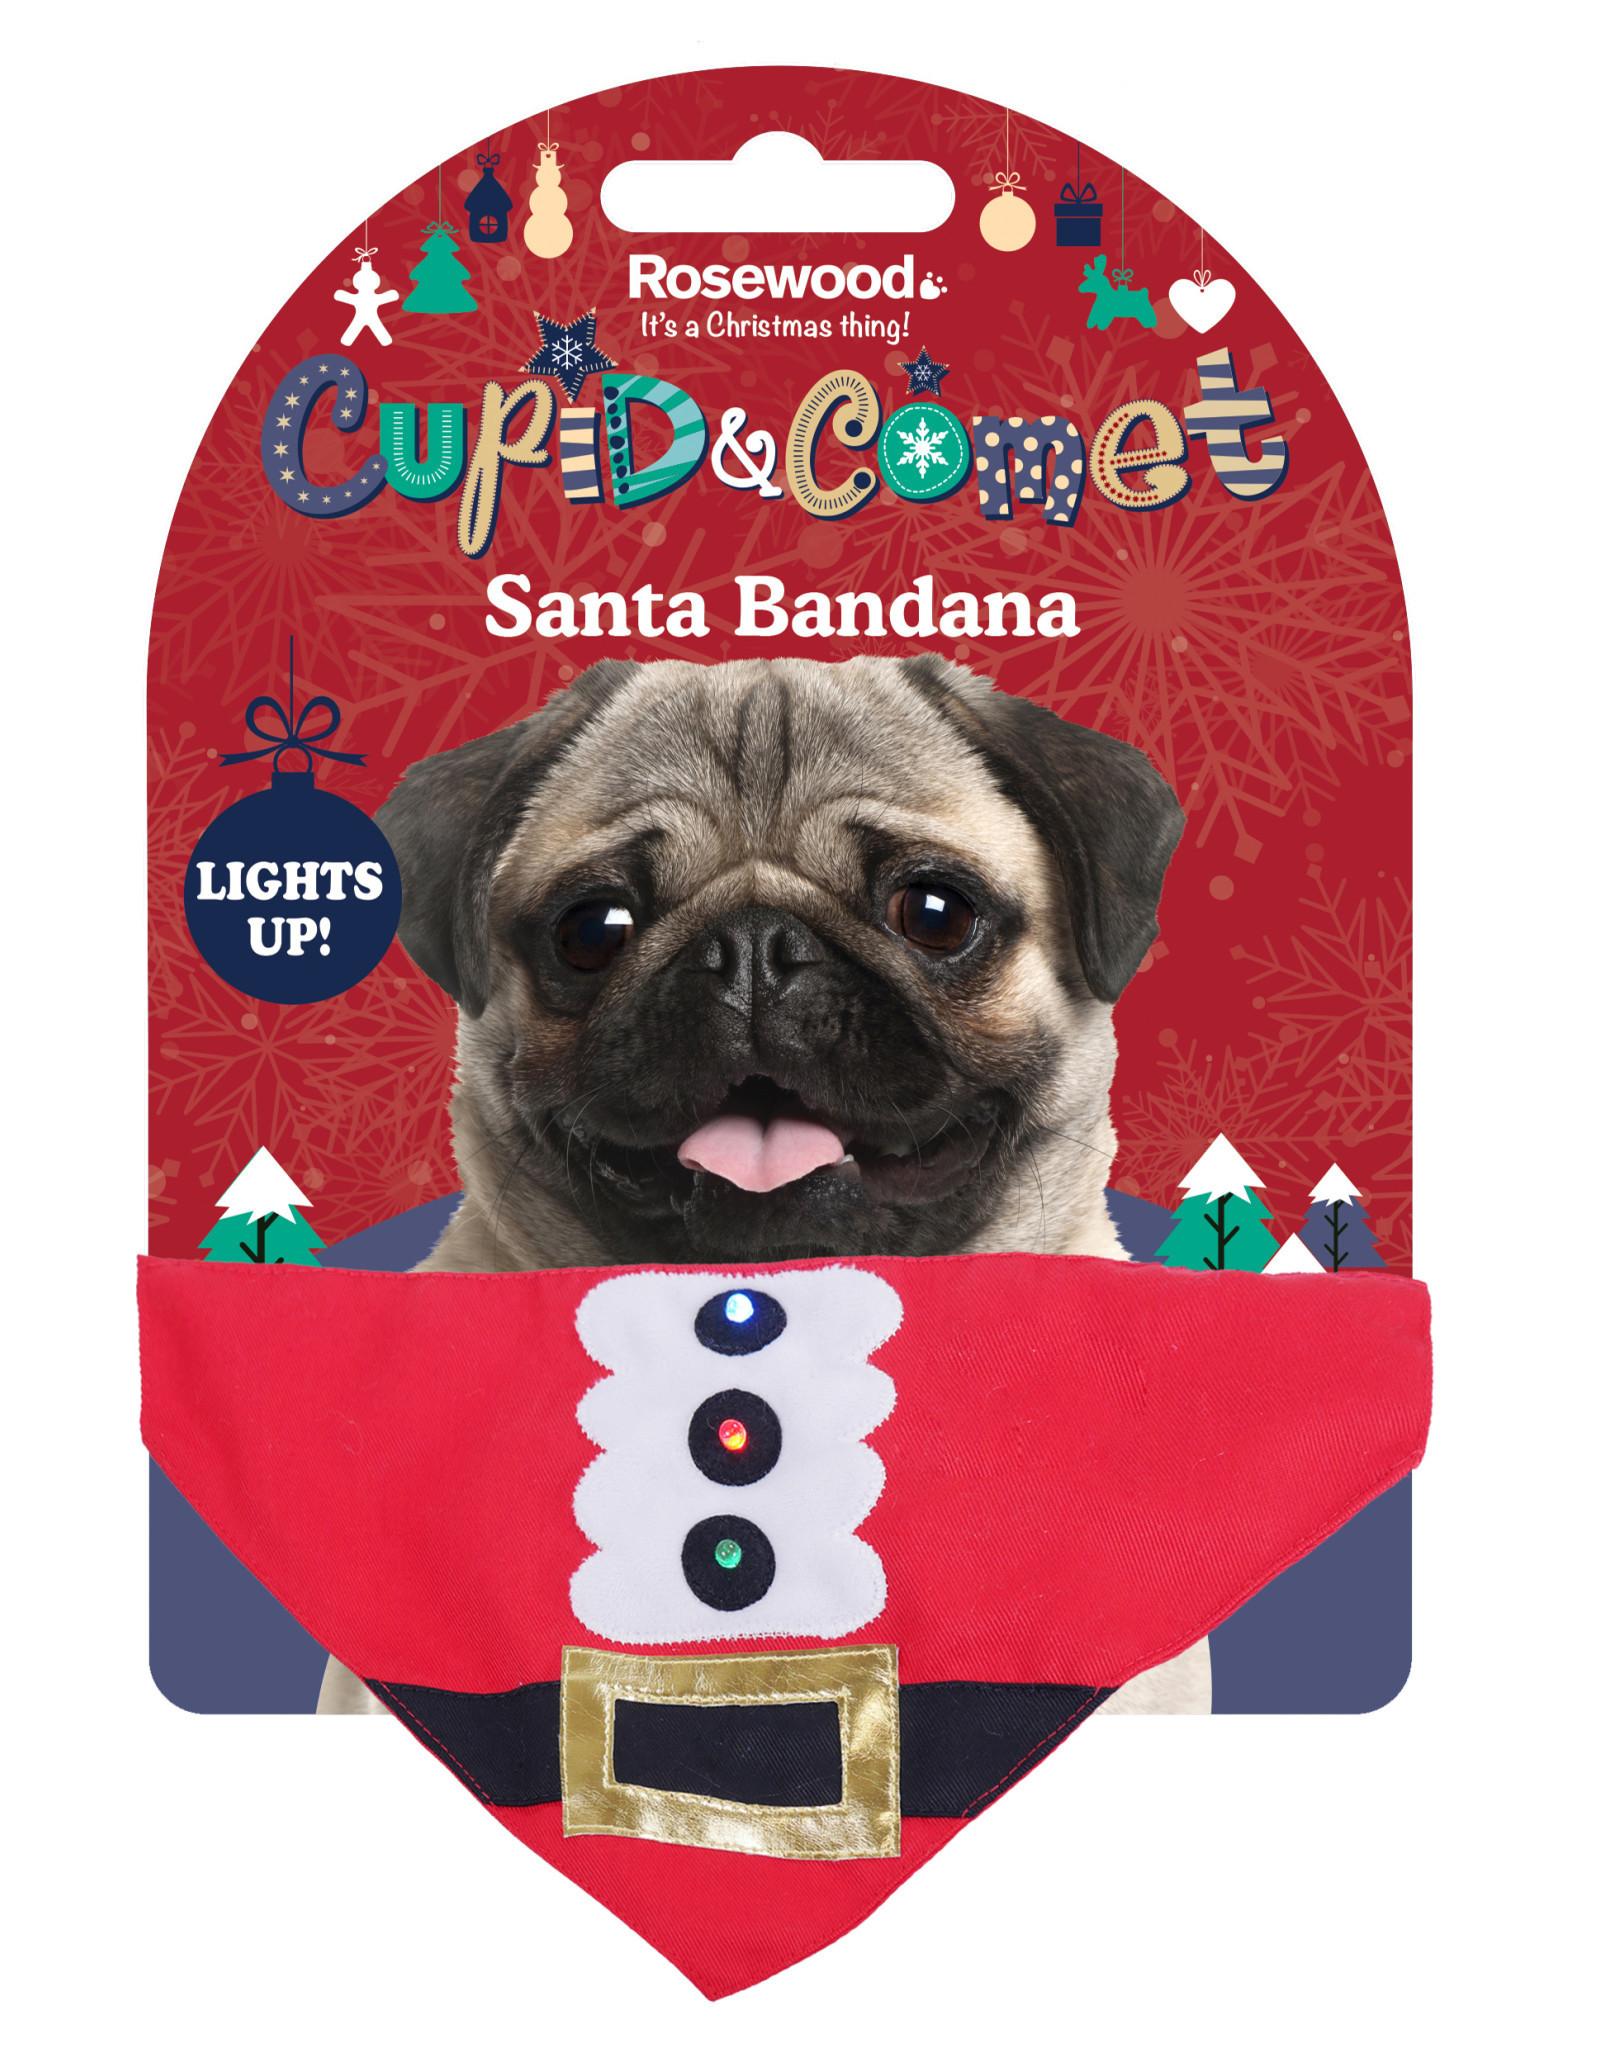 Rosewood Christmas Light Up Santa Bandana for Dogs